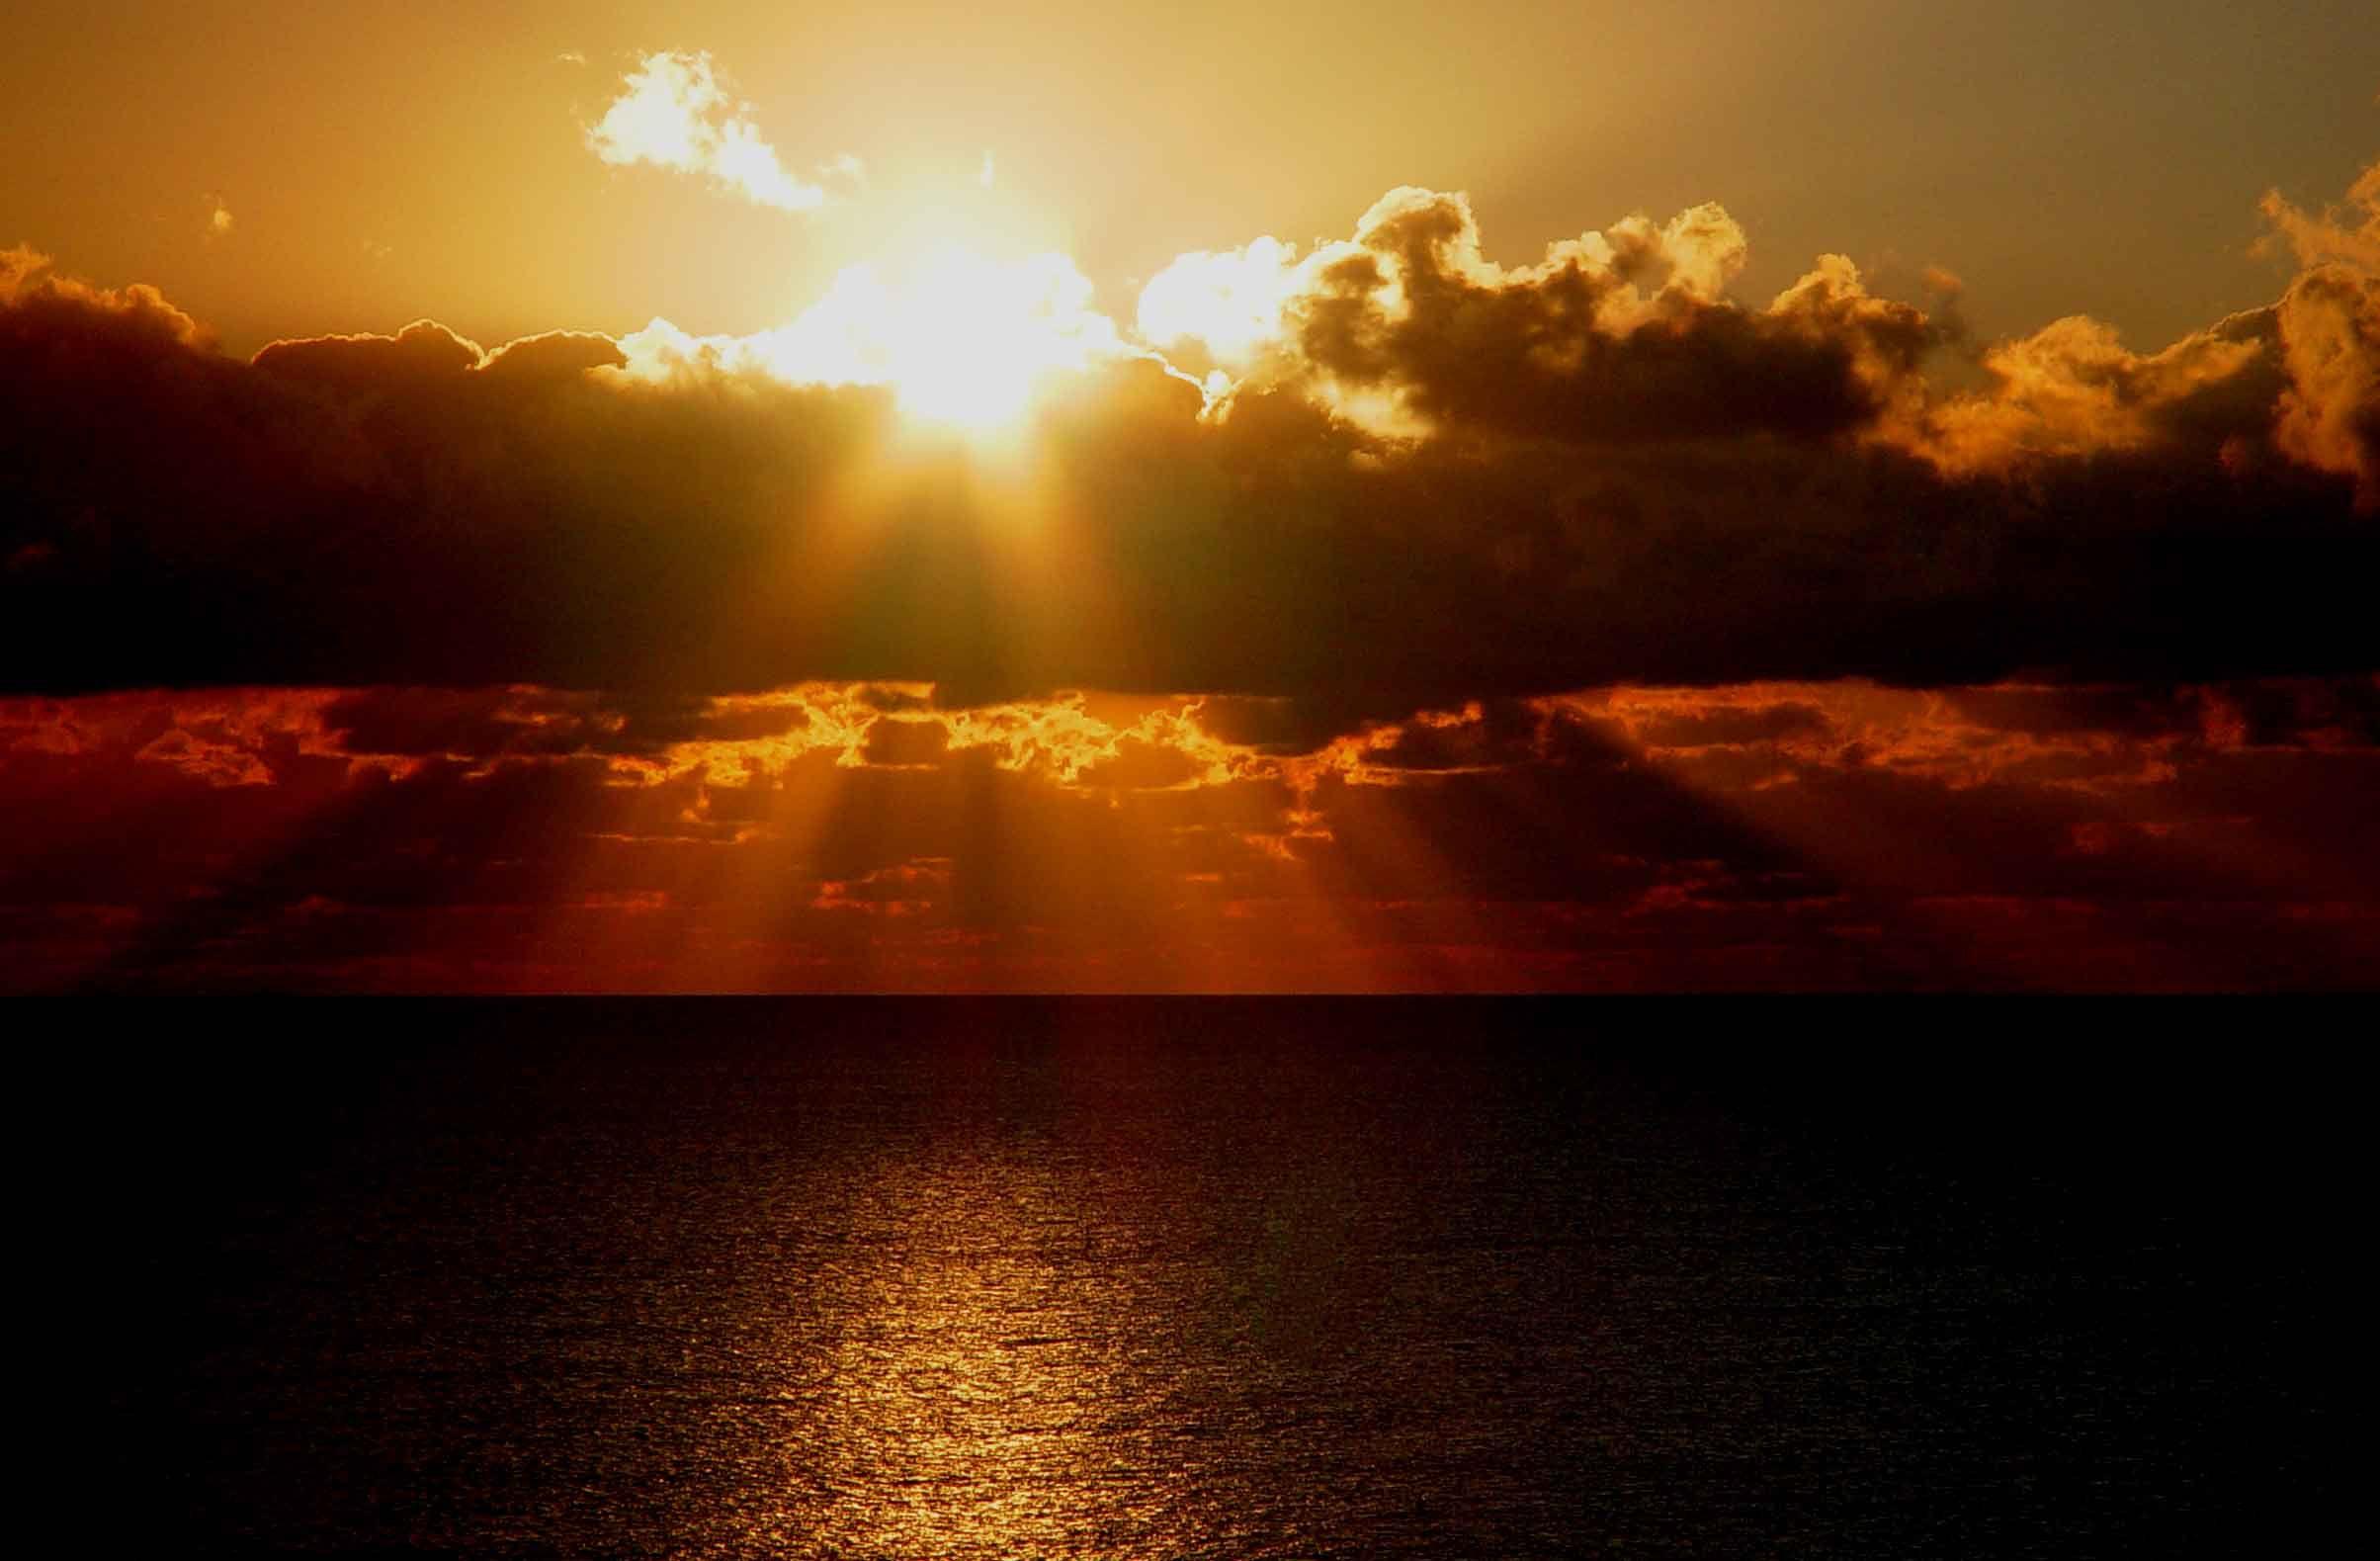 30 BEAUTIFUL SUNRISE -SUNSET WALLPAPERS FREE TO DOWNLOAD   Cancun ...